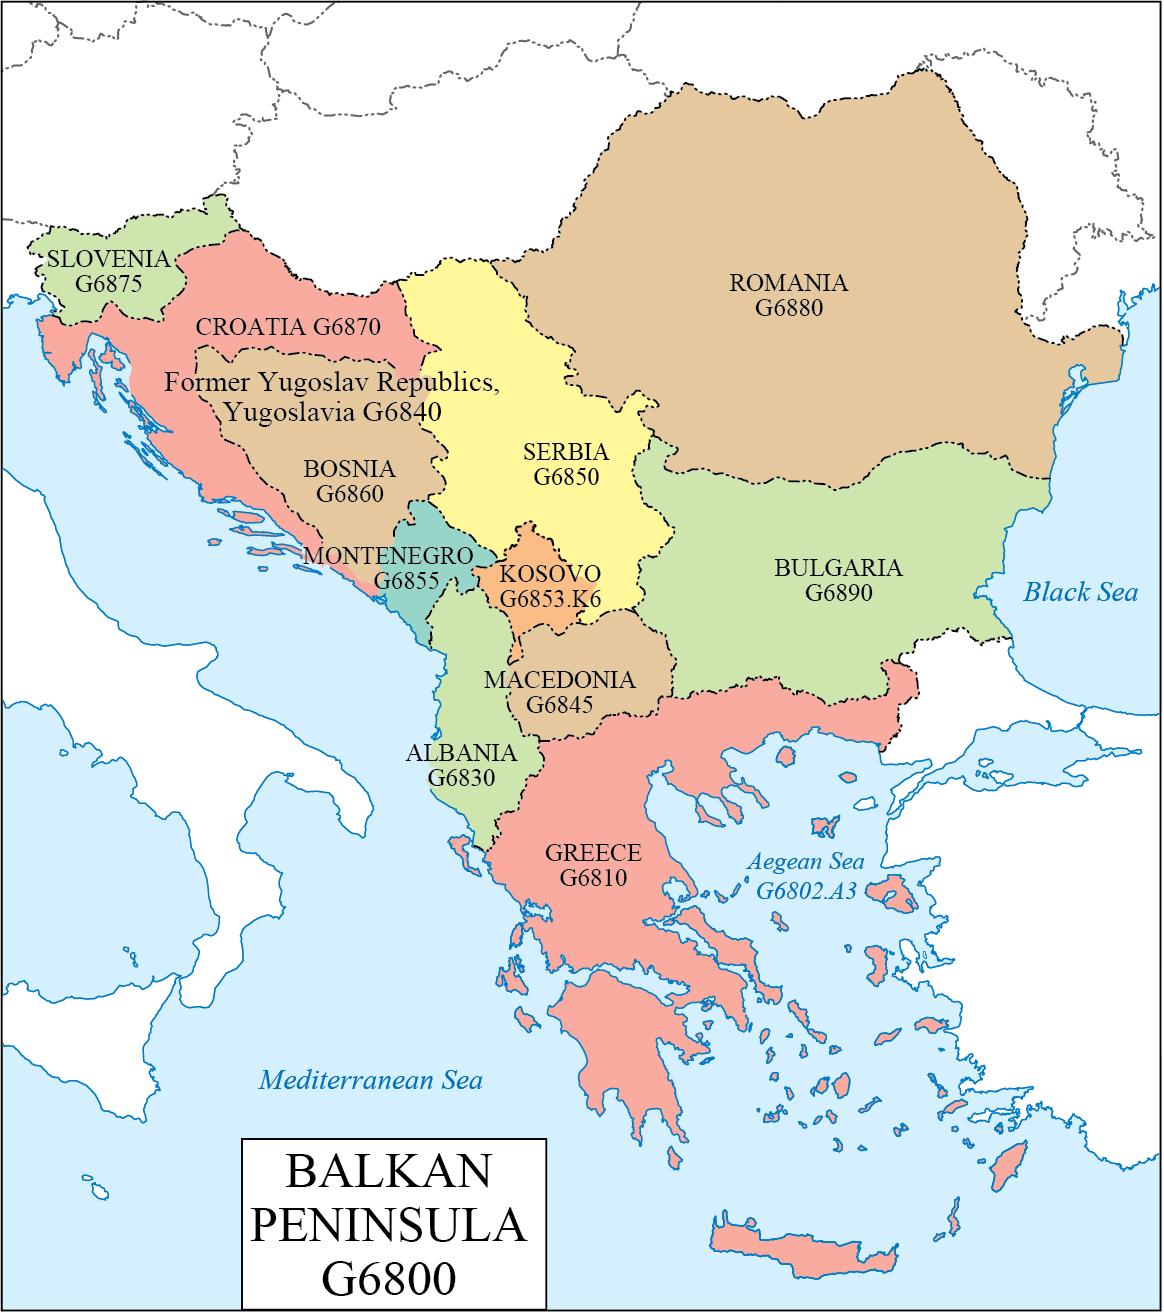 Balkan Peninsulatriangular arm of land that juts from